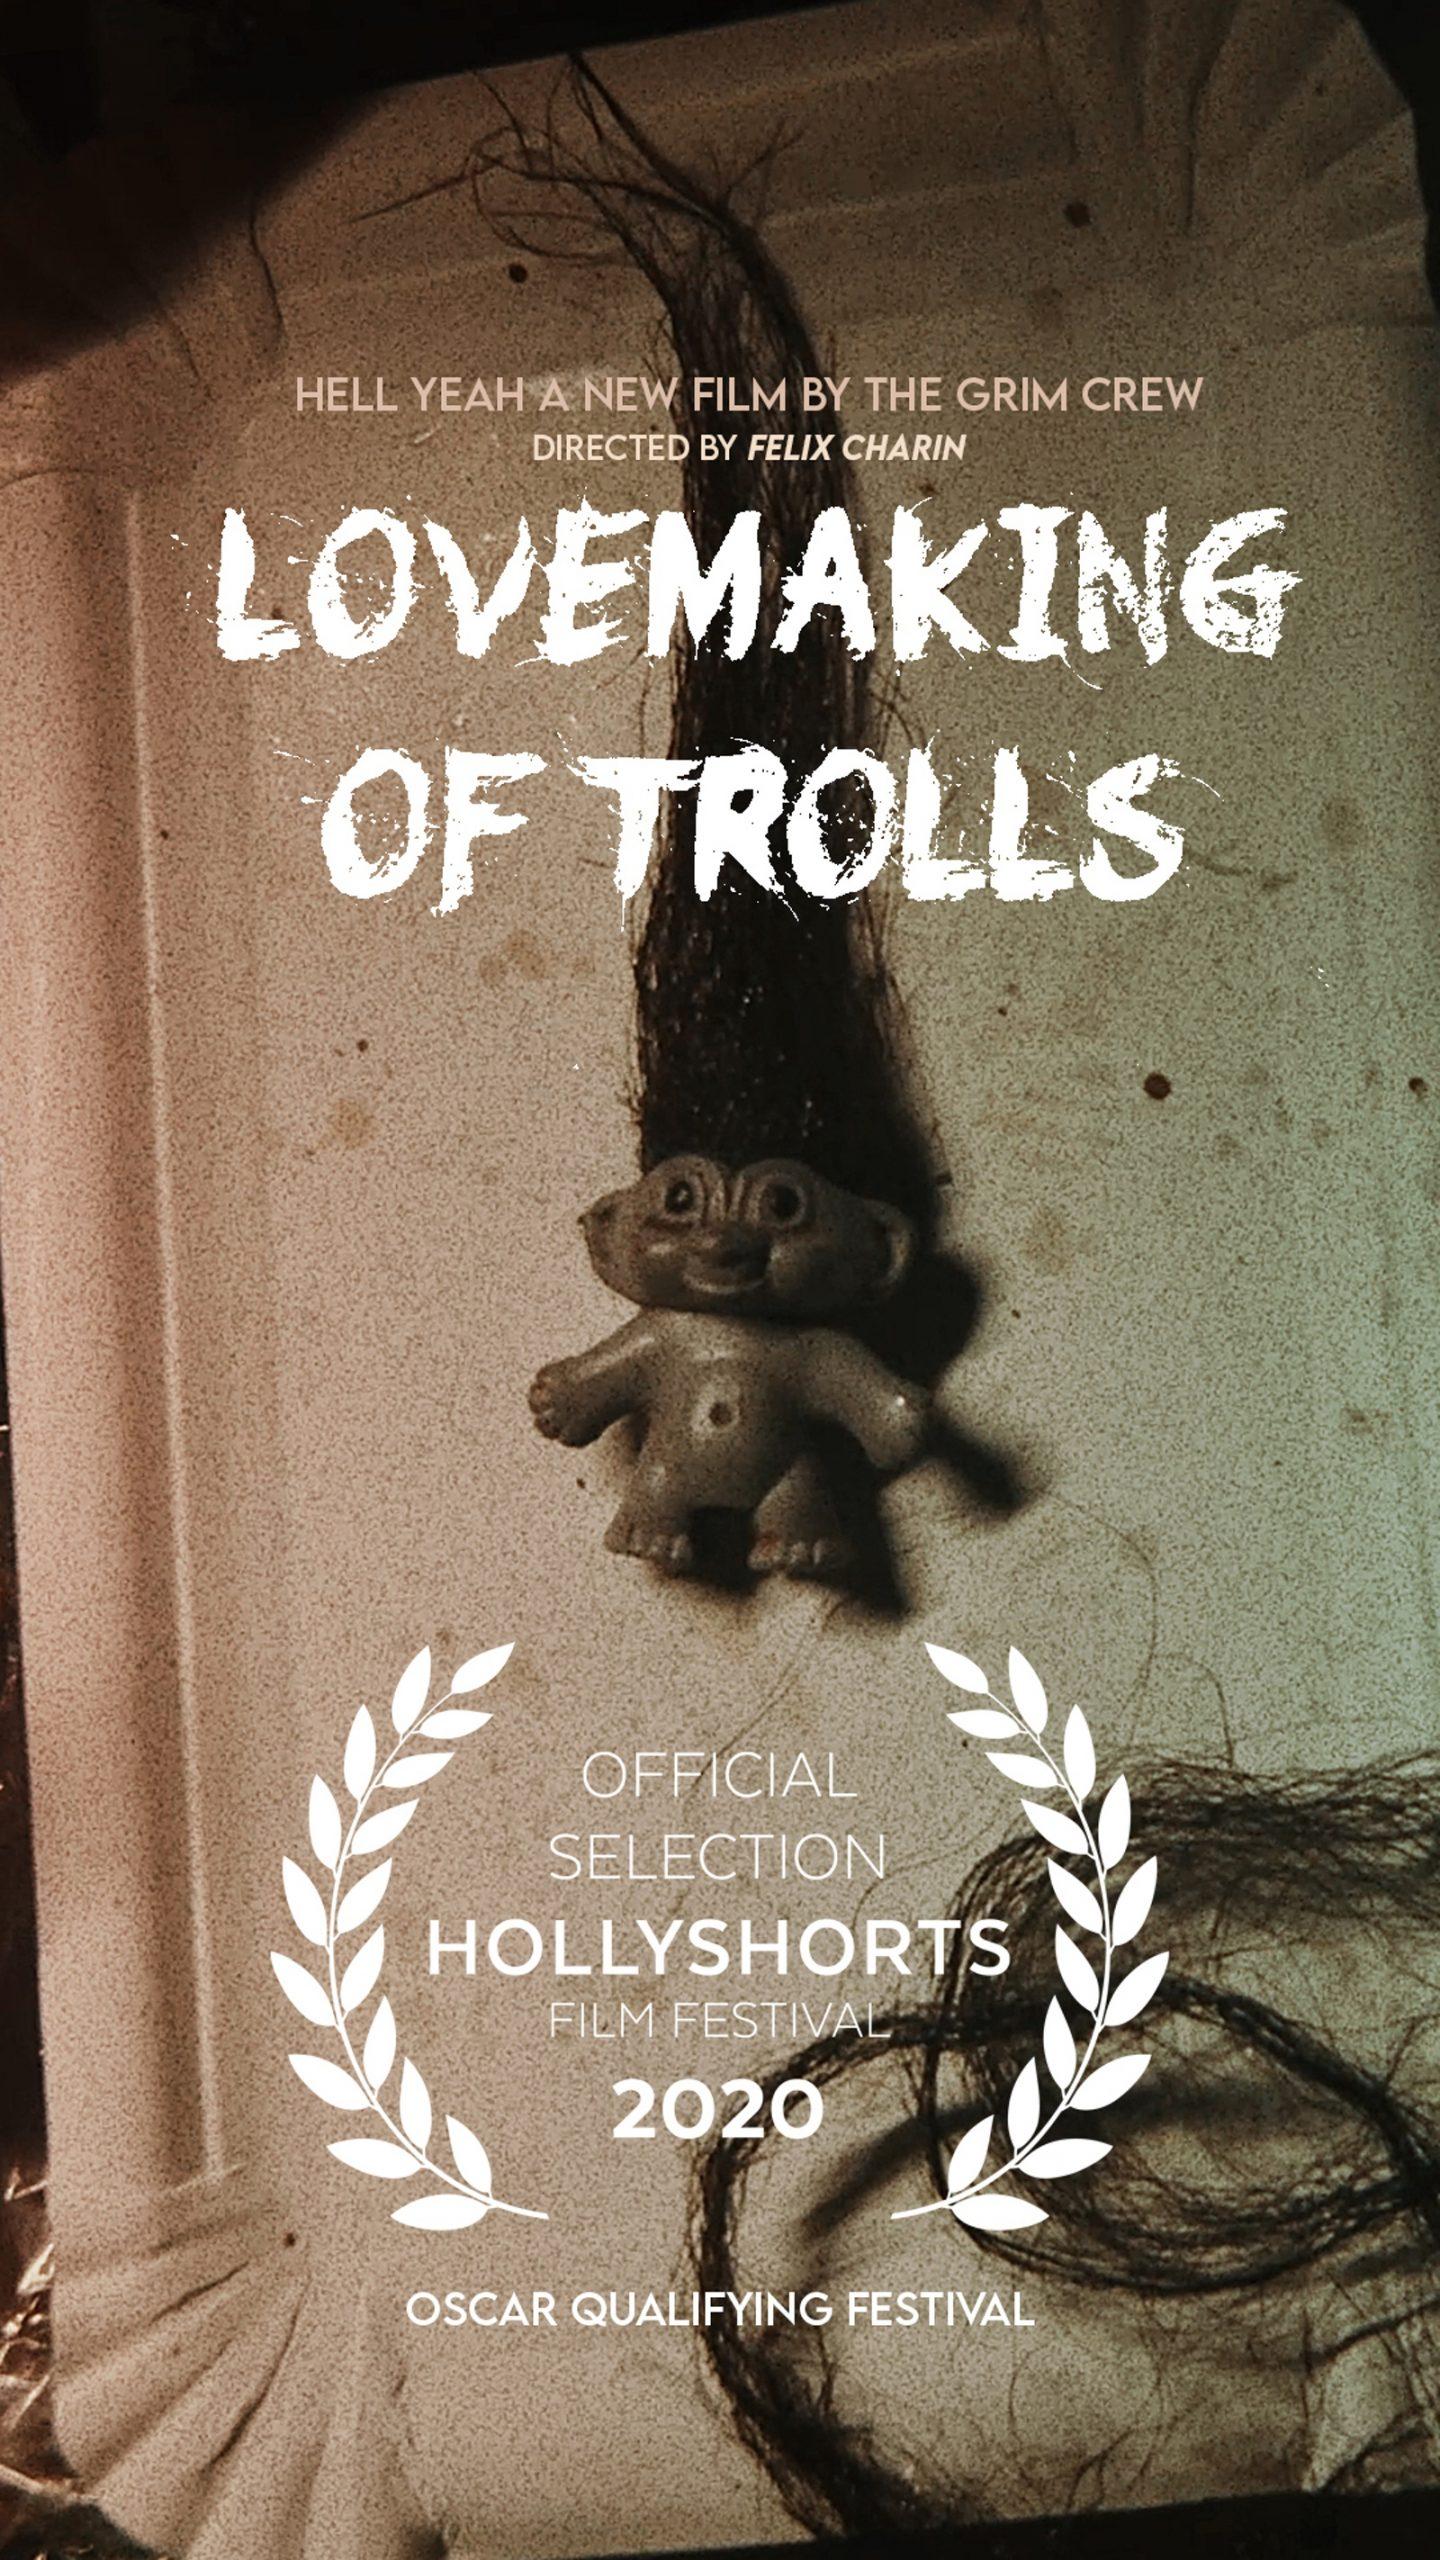 Lovemaking of Trolls